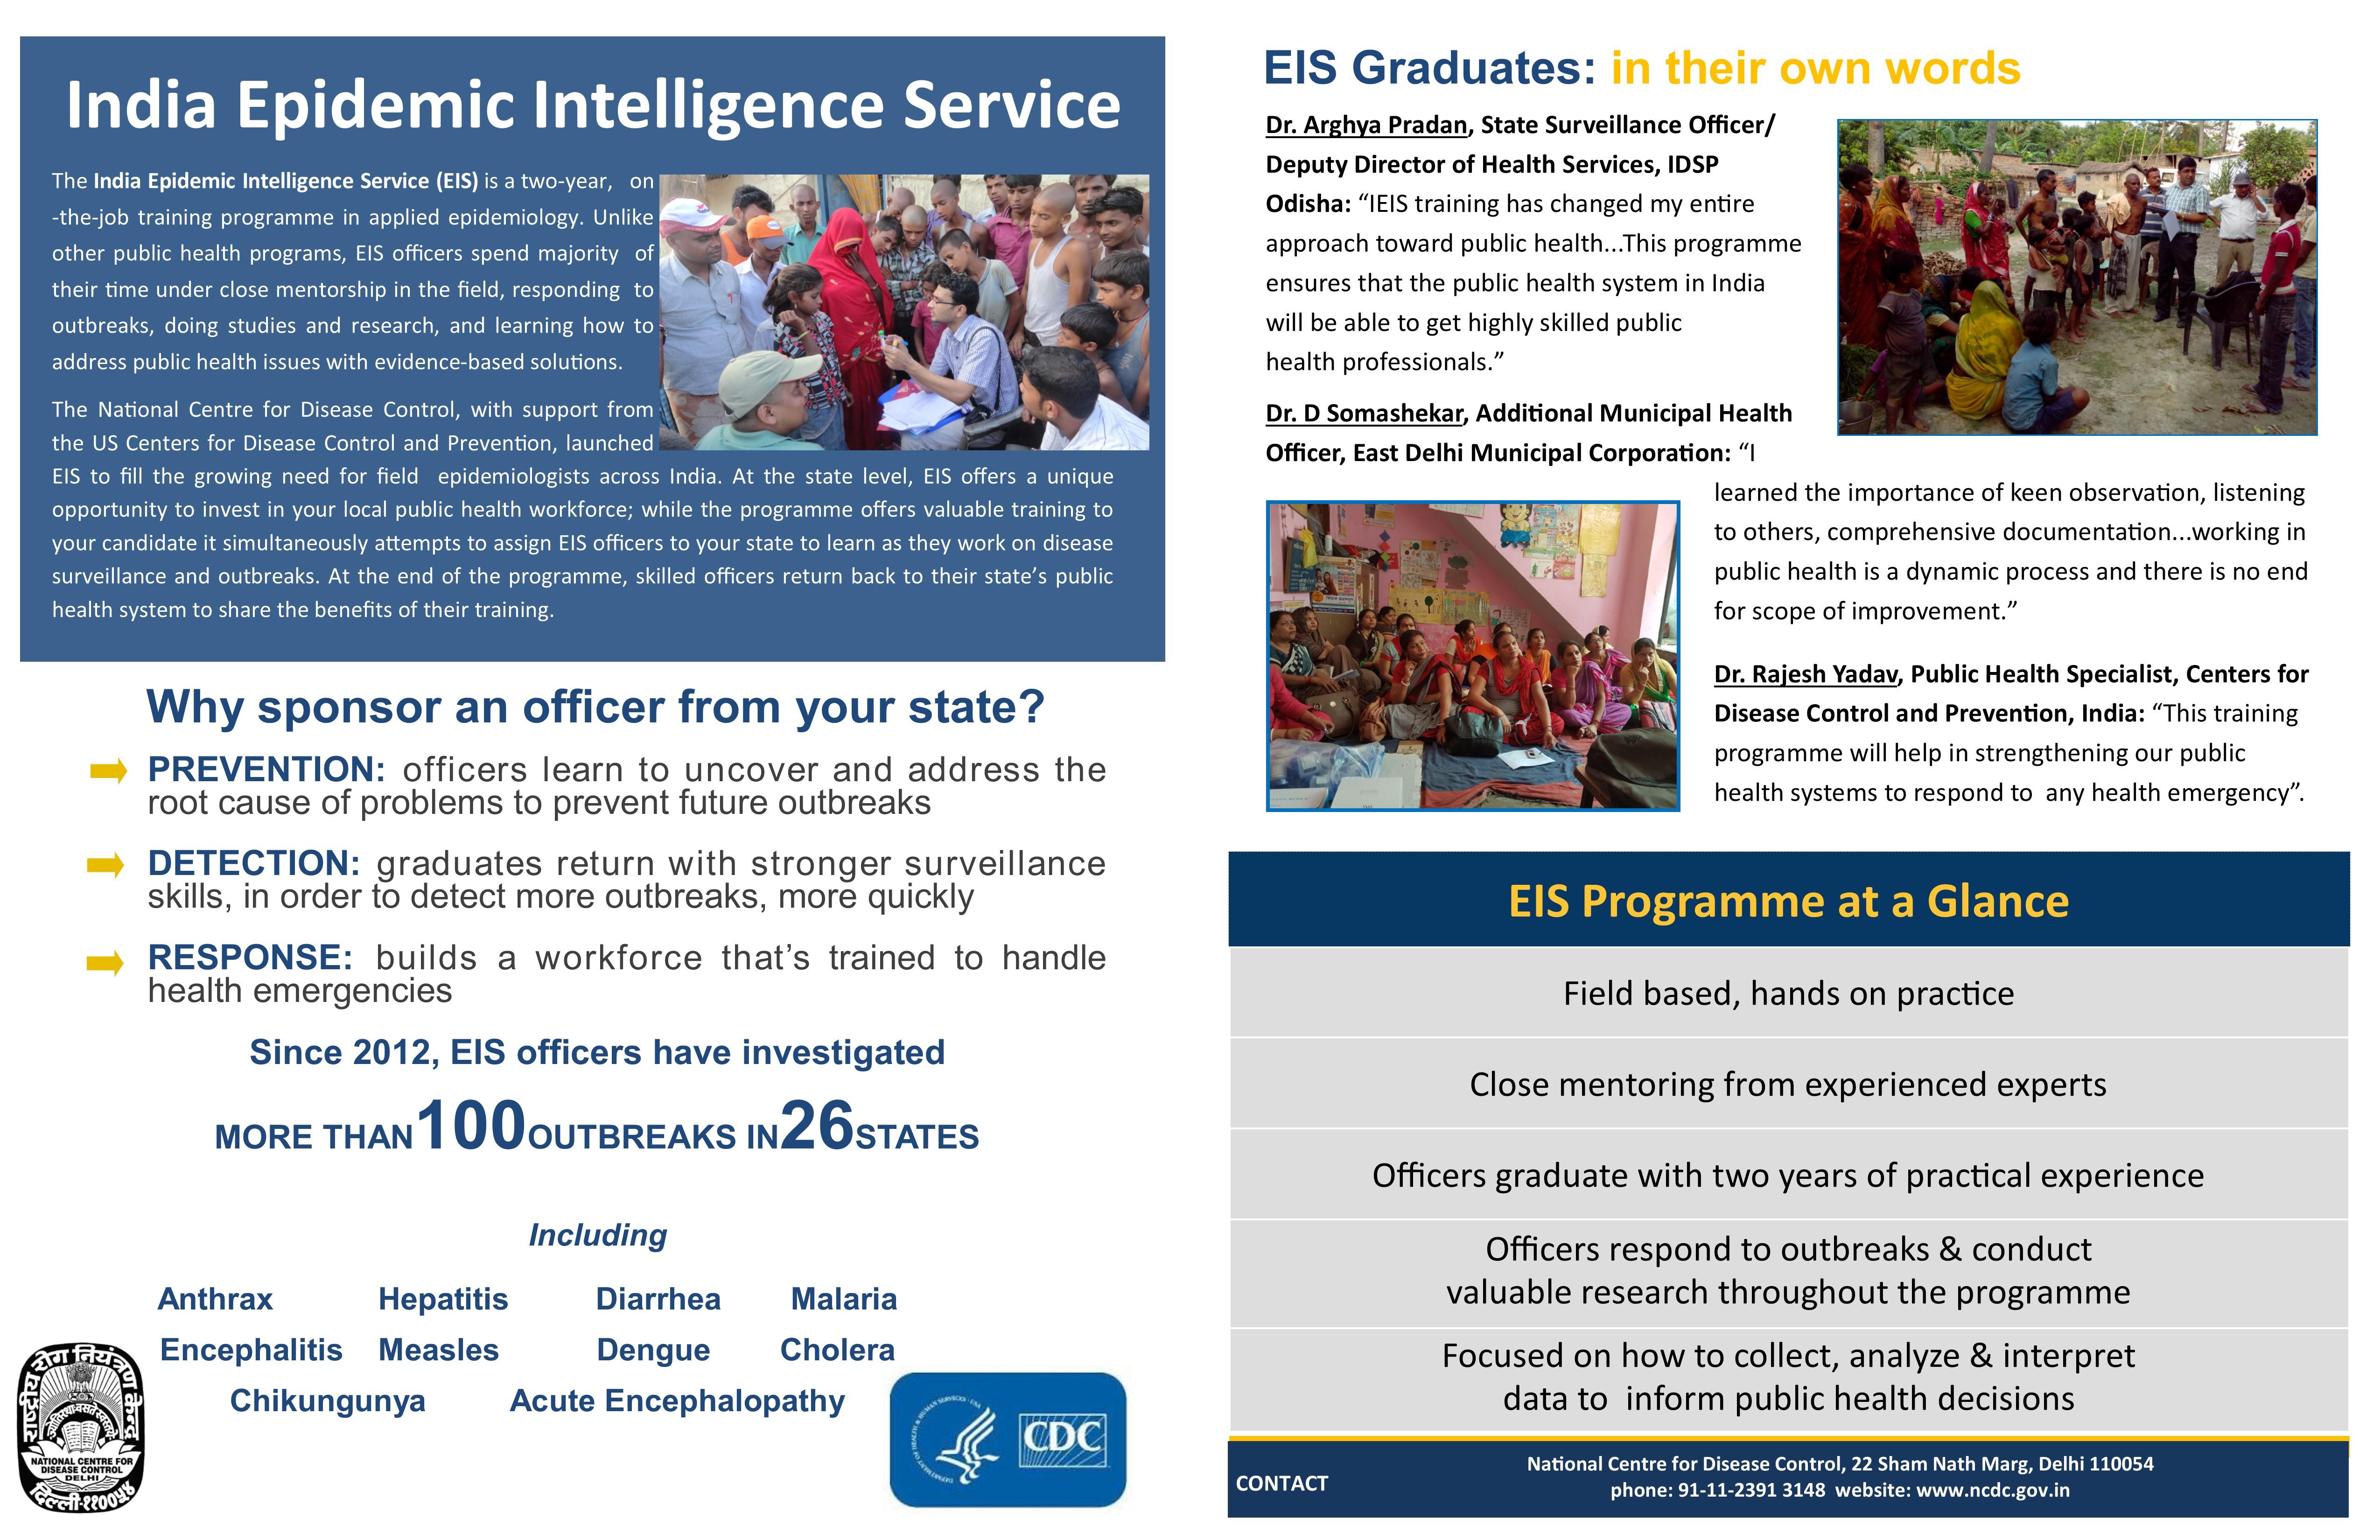 Strategic Alliance Management Services Pvt Ltd